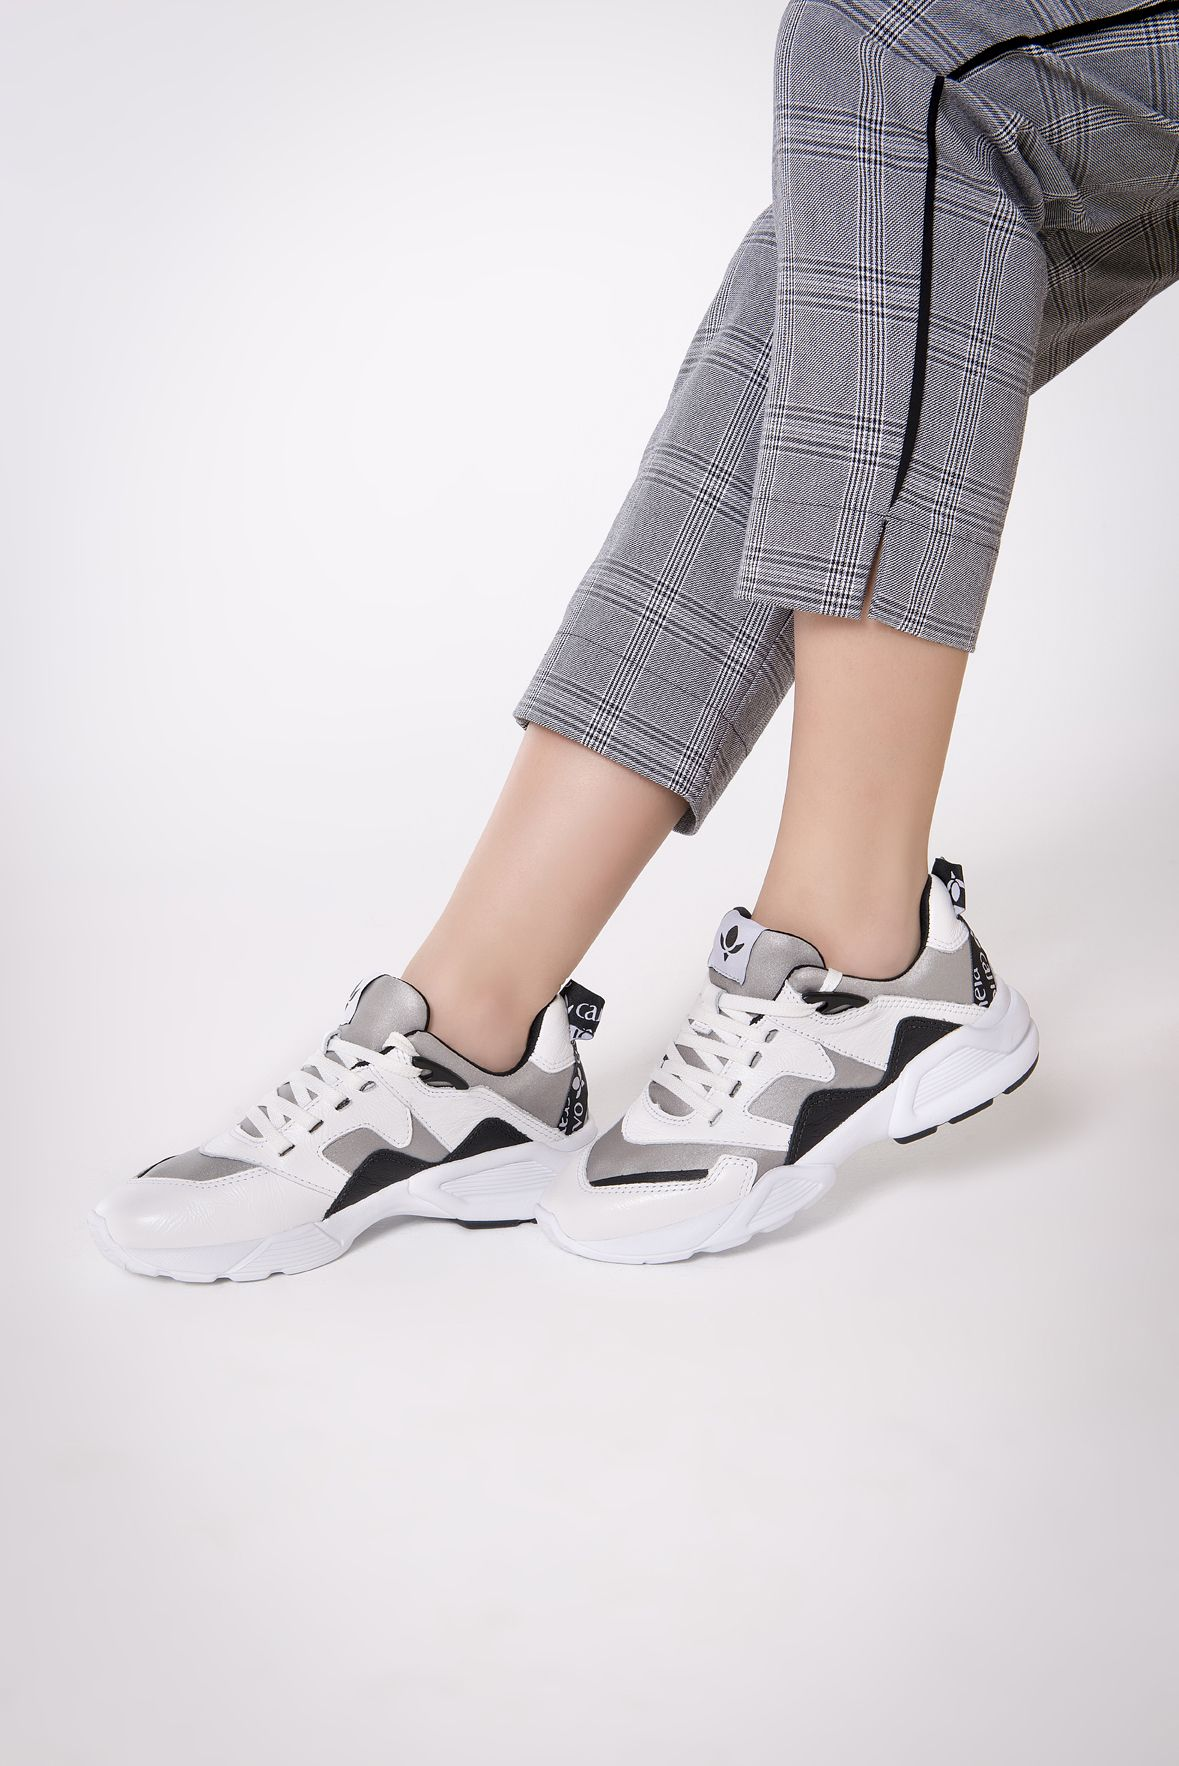 90b29683274 Tênis chunky shoes nas cores preto